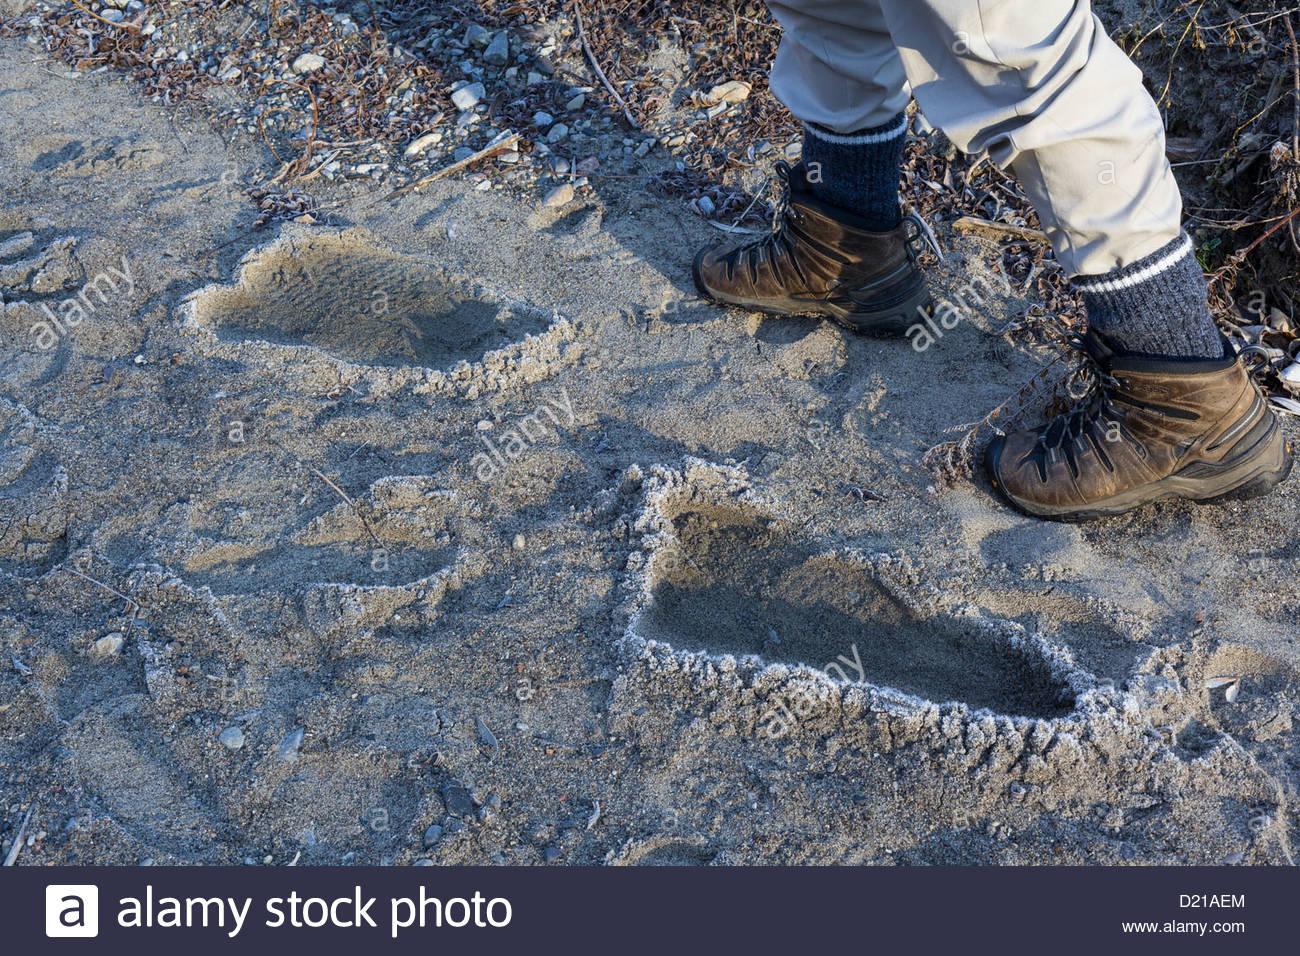 Scientific-proof-that-Bigfoot-roams-the-